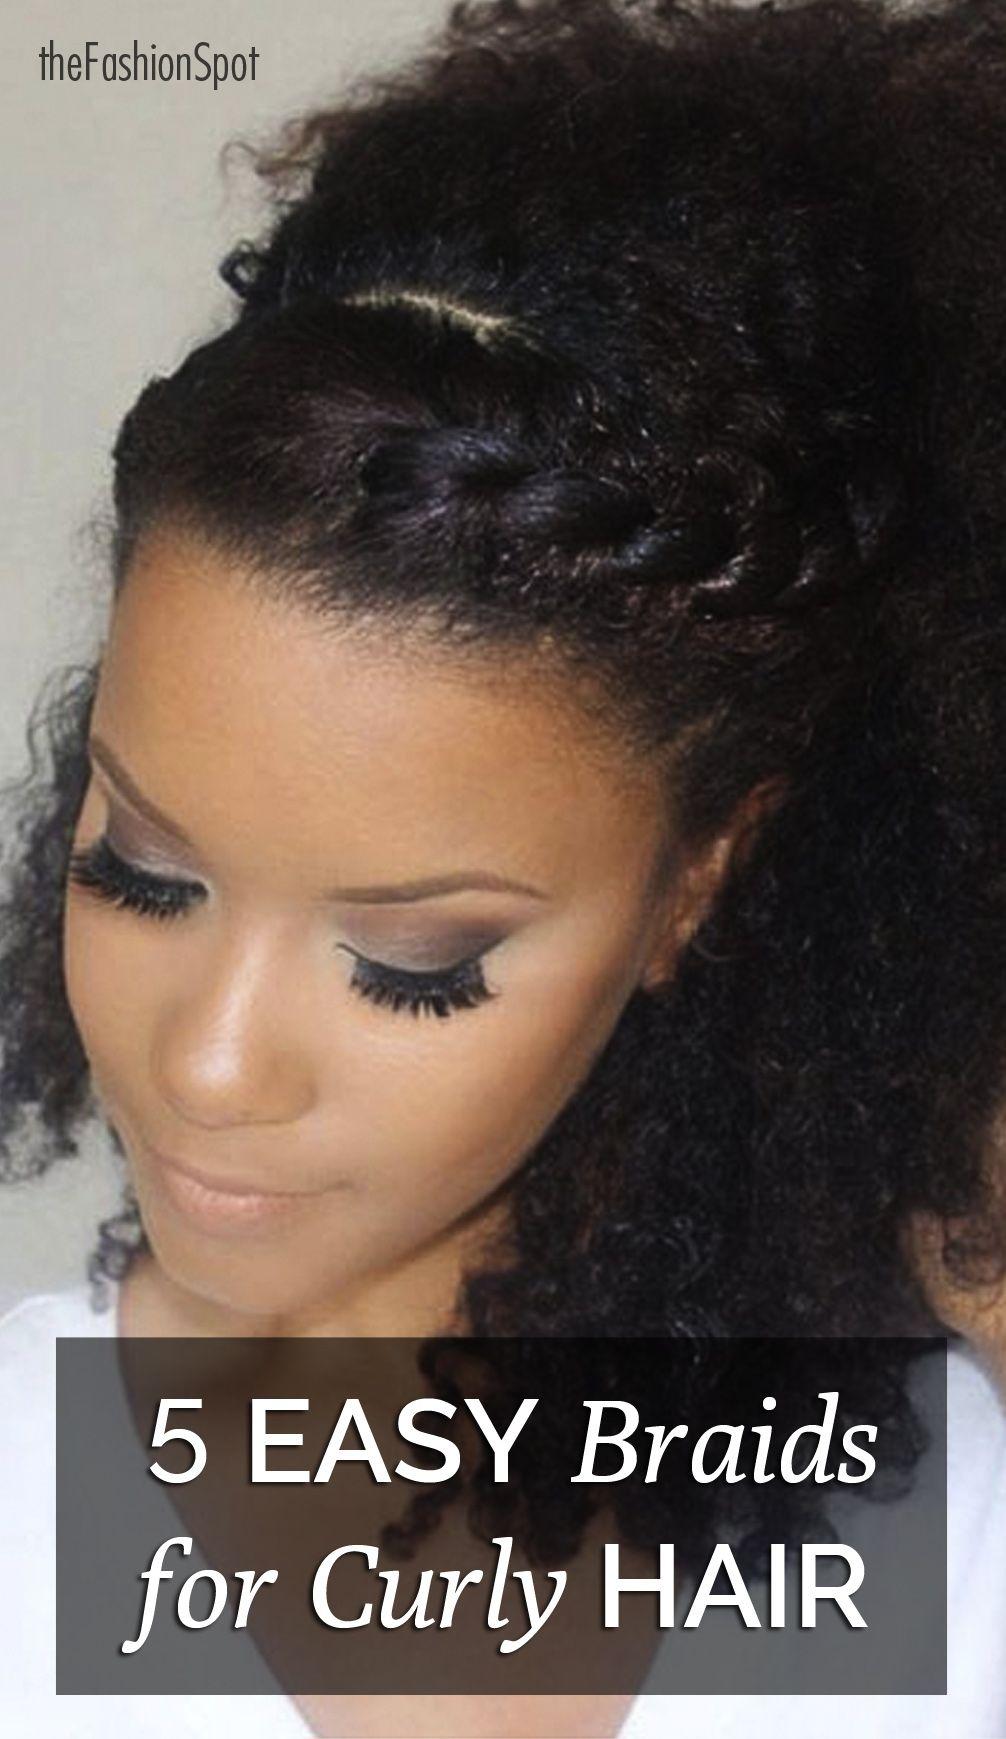 Easy Braids for Curly Hair - the Fashion Spot | // HAIR ...